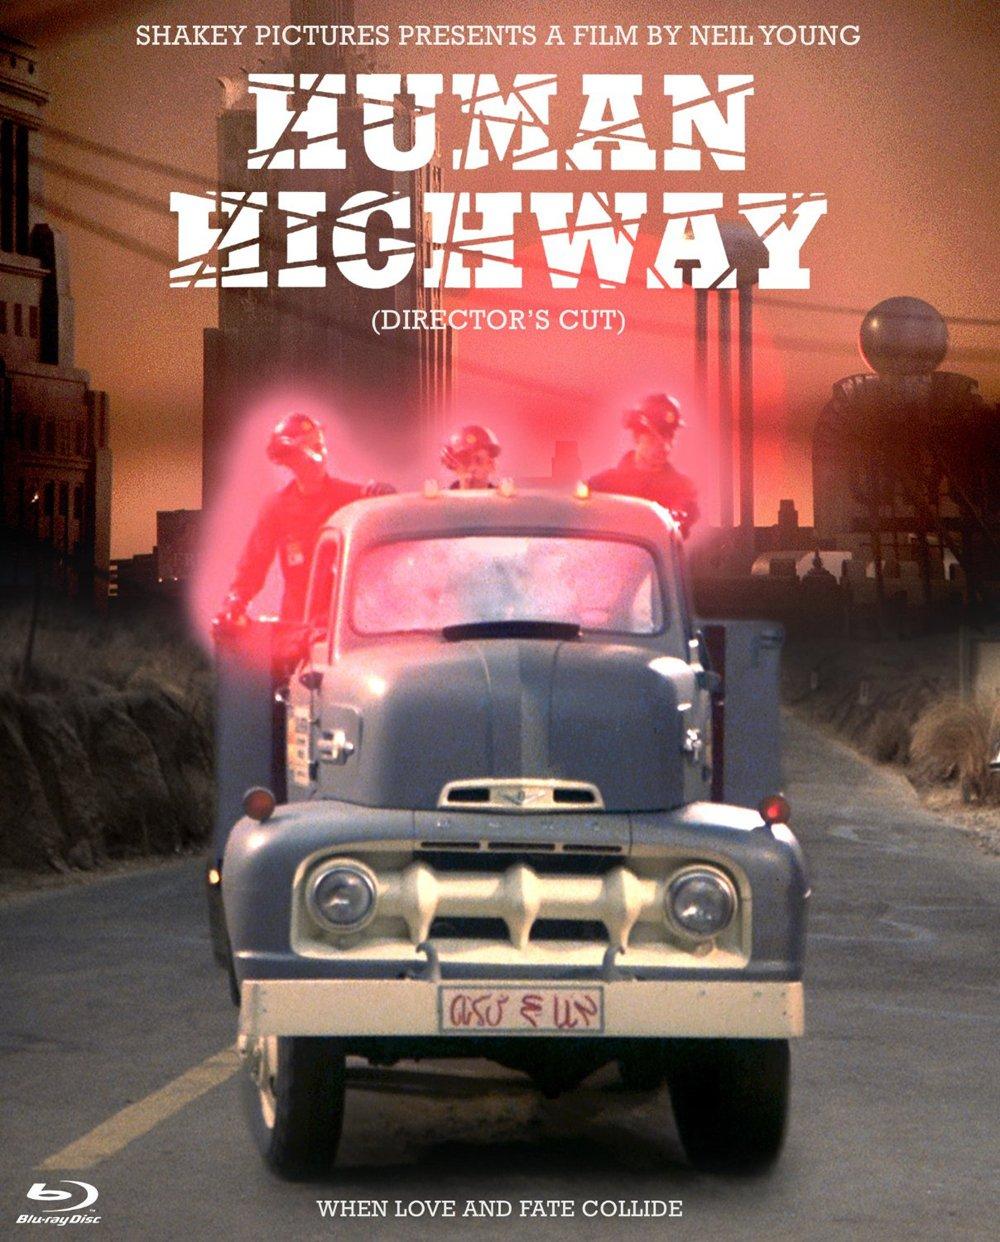 Human Highway (Director's Cut)(Blu-Ray)